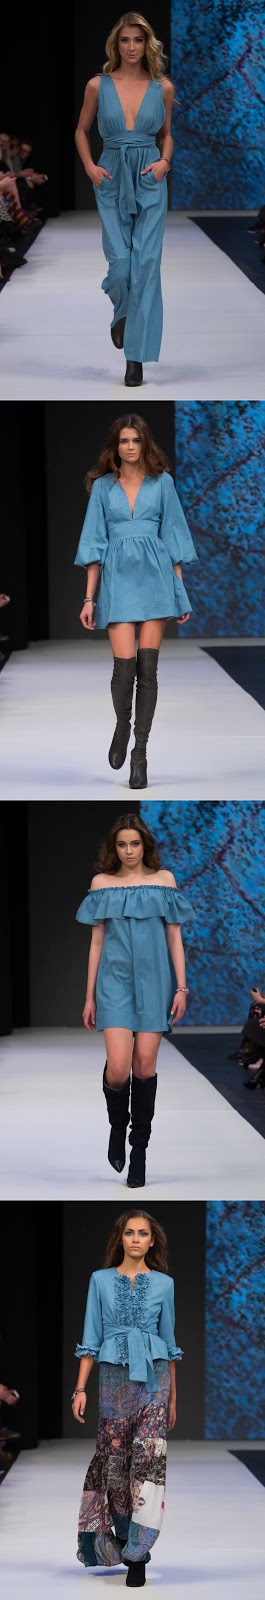 Natalia Jaroszewska XIII FashionPhilosophy Fashion Week Poland (c) 2015 Mike Pasarella